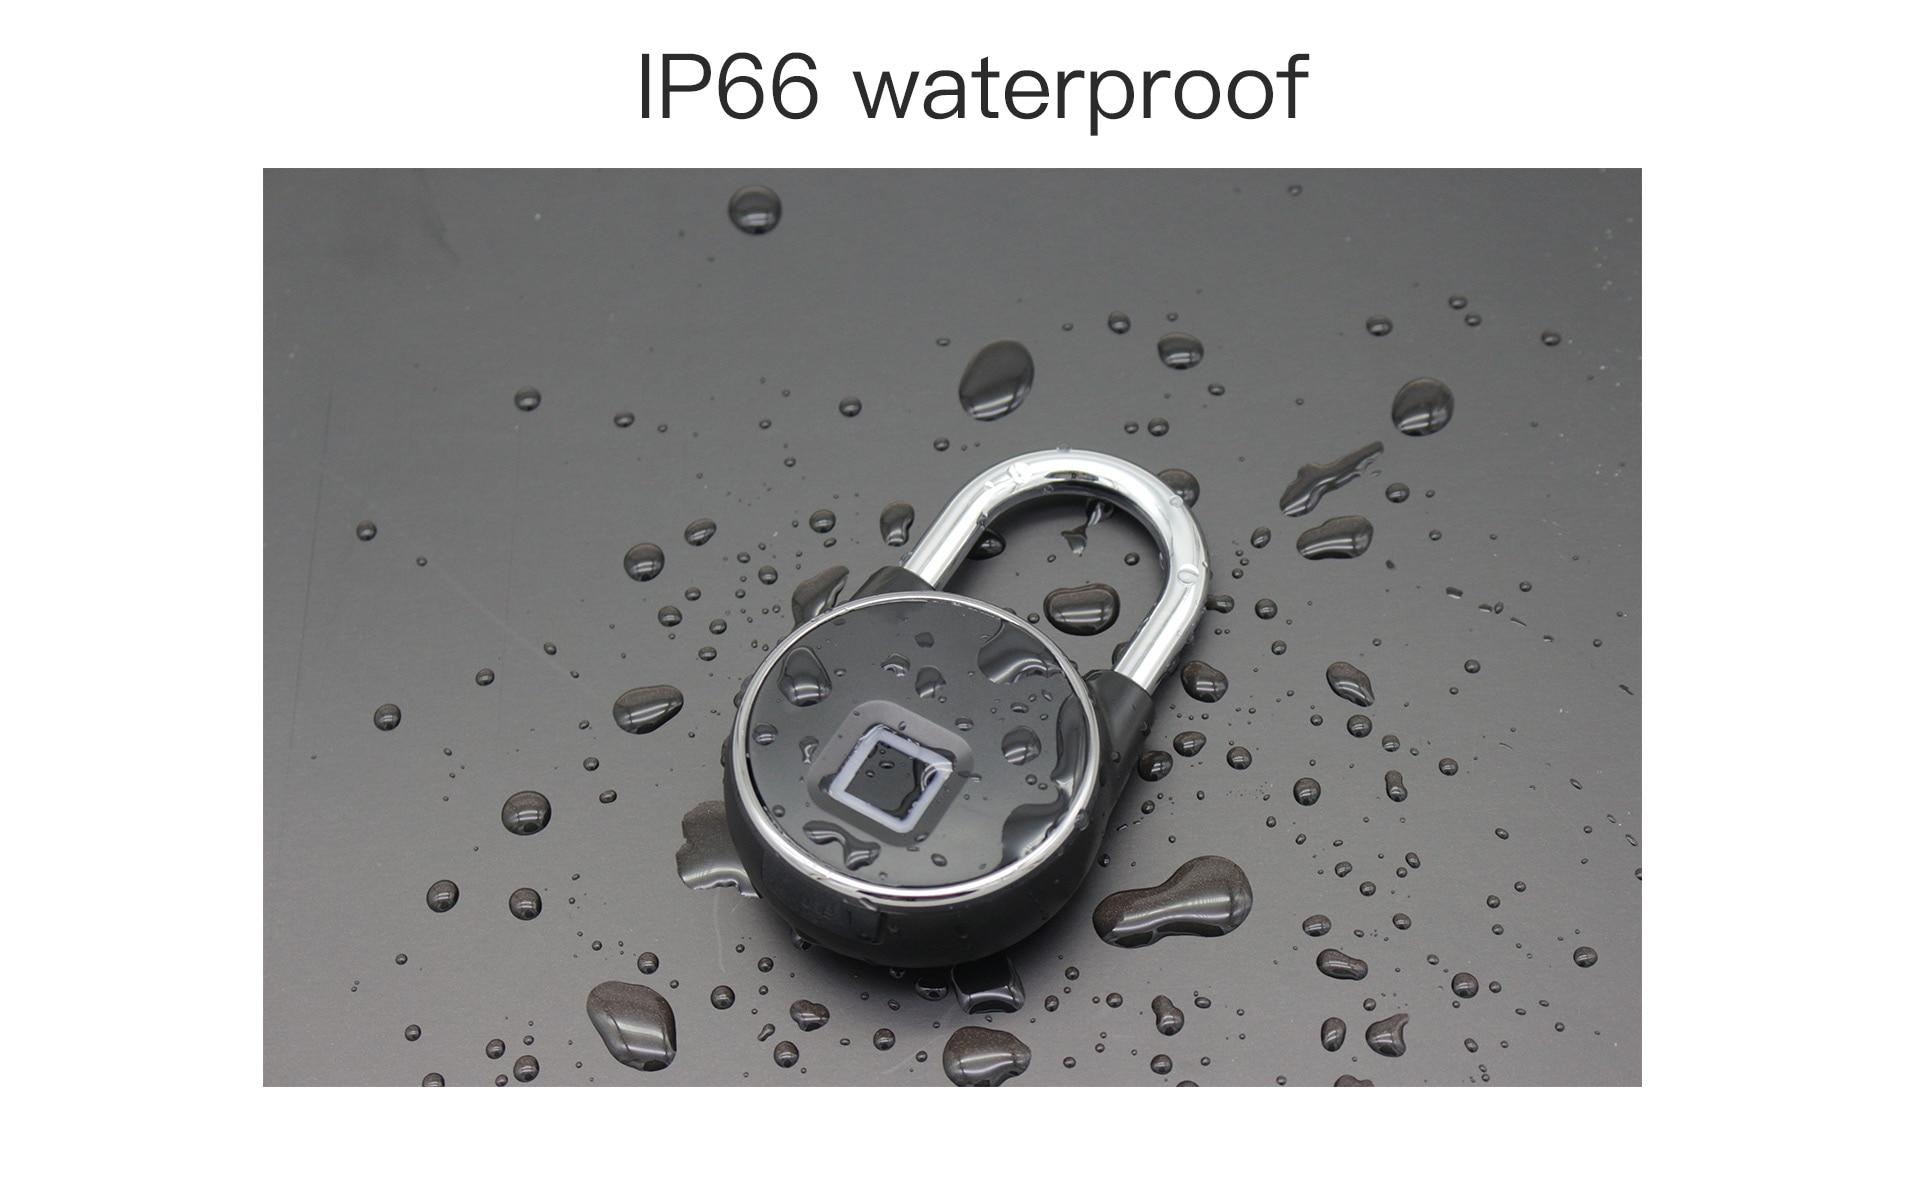 HTB1VAFsXf1H3KVjSZFHq6zKppXal Portable bluetooth Lock Smart Padlock Keyless Fingerprint Lock Anti-Theft Security Door Padlocks for Bag Drawer Suitcase